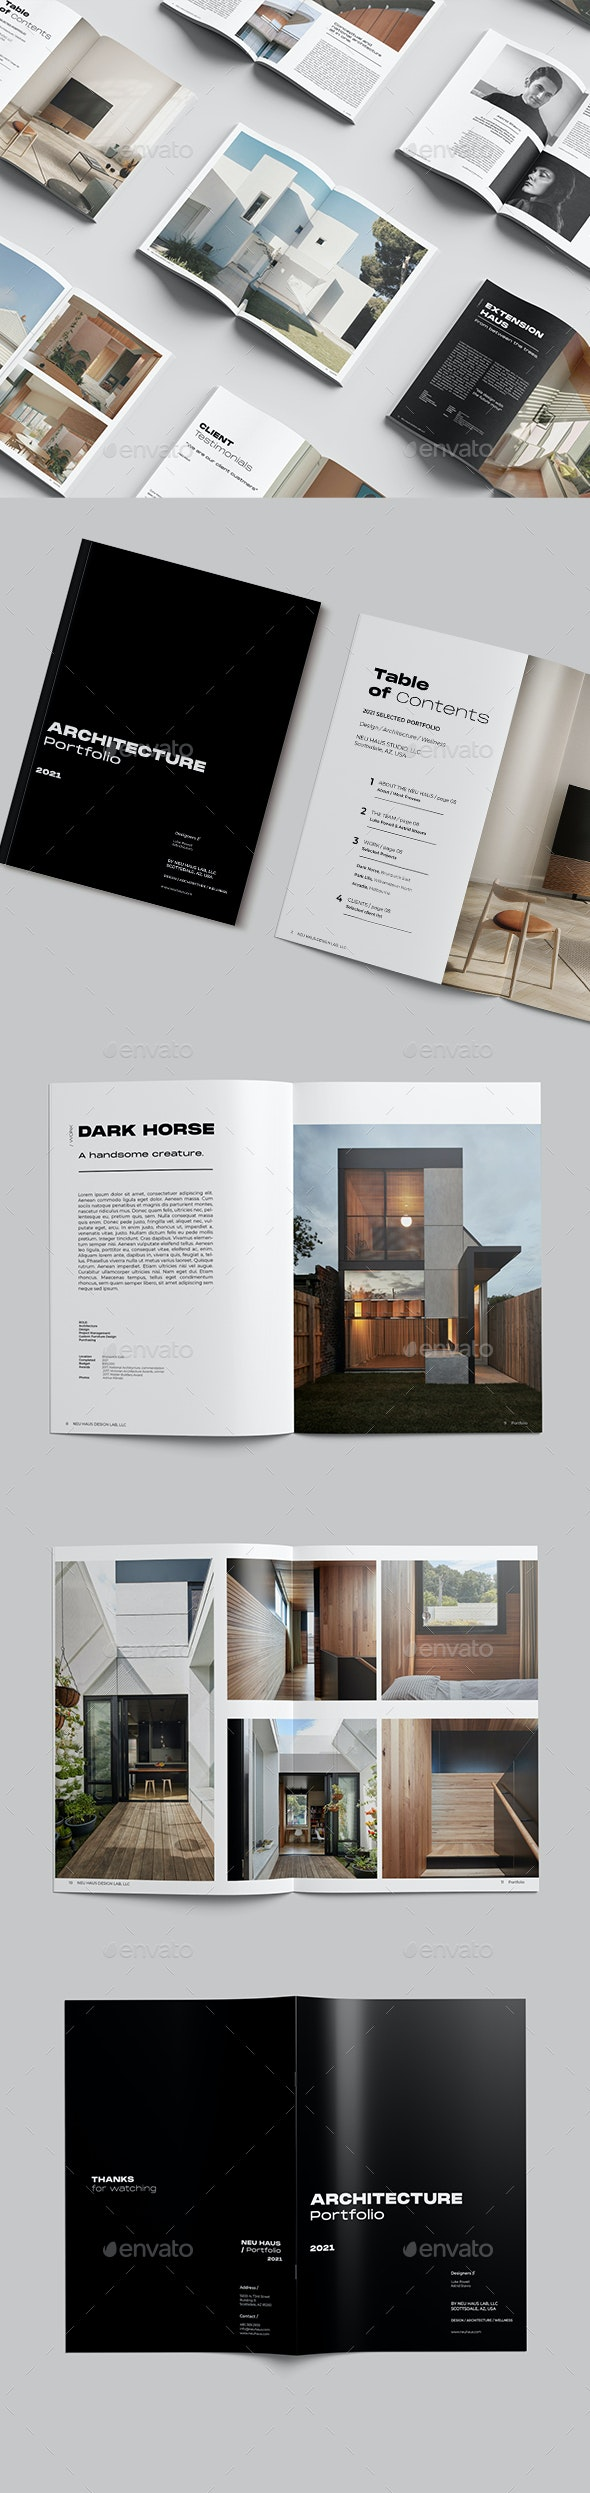 Architecture Portfolio Brochure - Portfolio Brochures